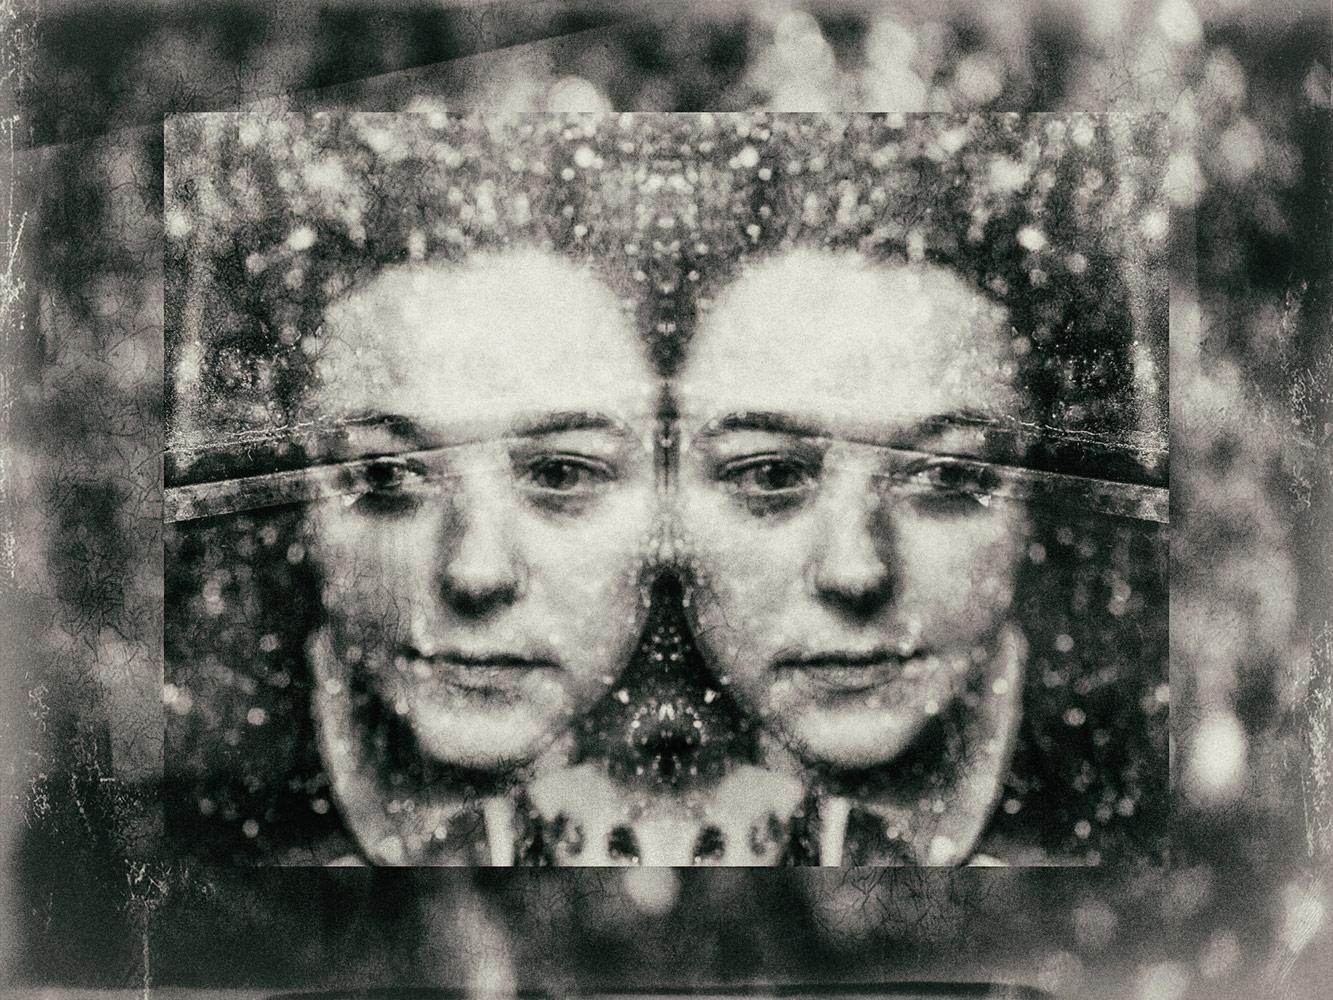 Muse, © L. Lejeune, Berkeley, CA, United States, Professional : Self-Portraits, PDN Faces - Portrait Photography Contest